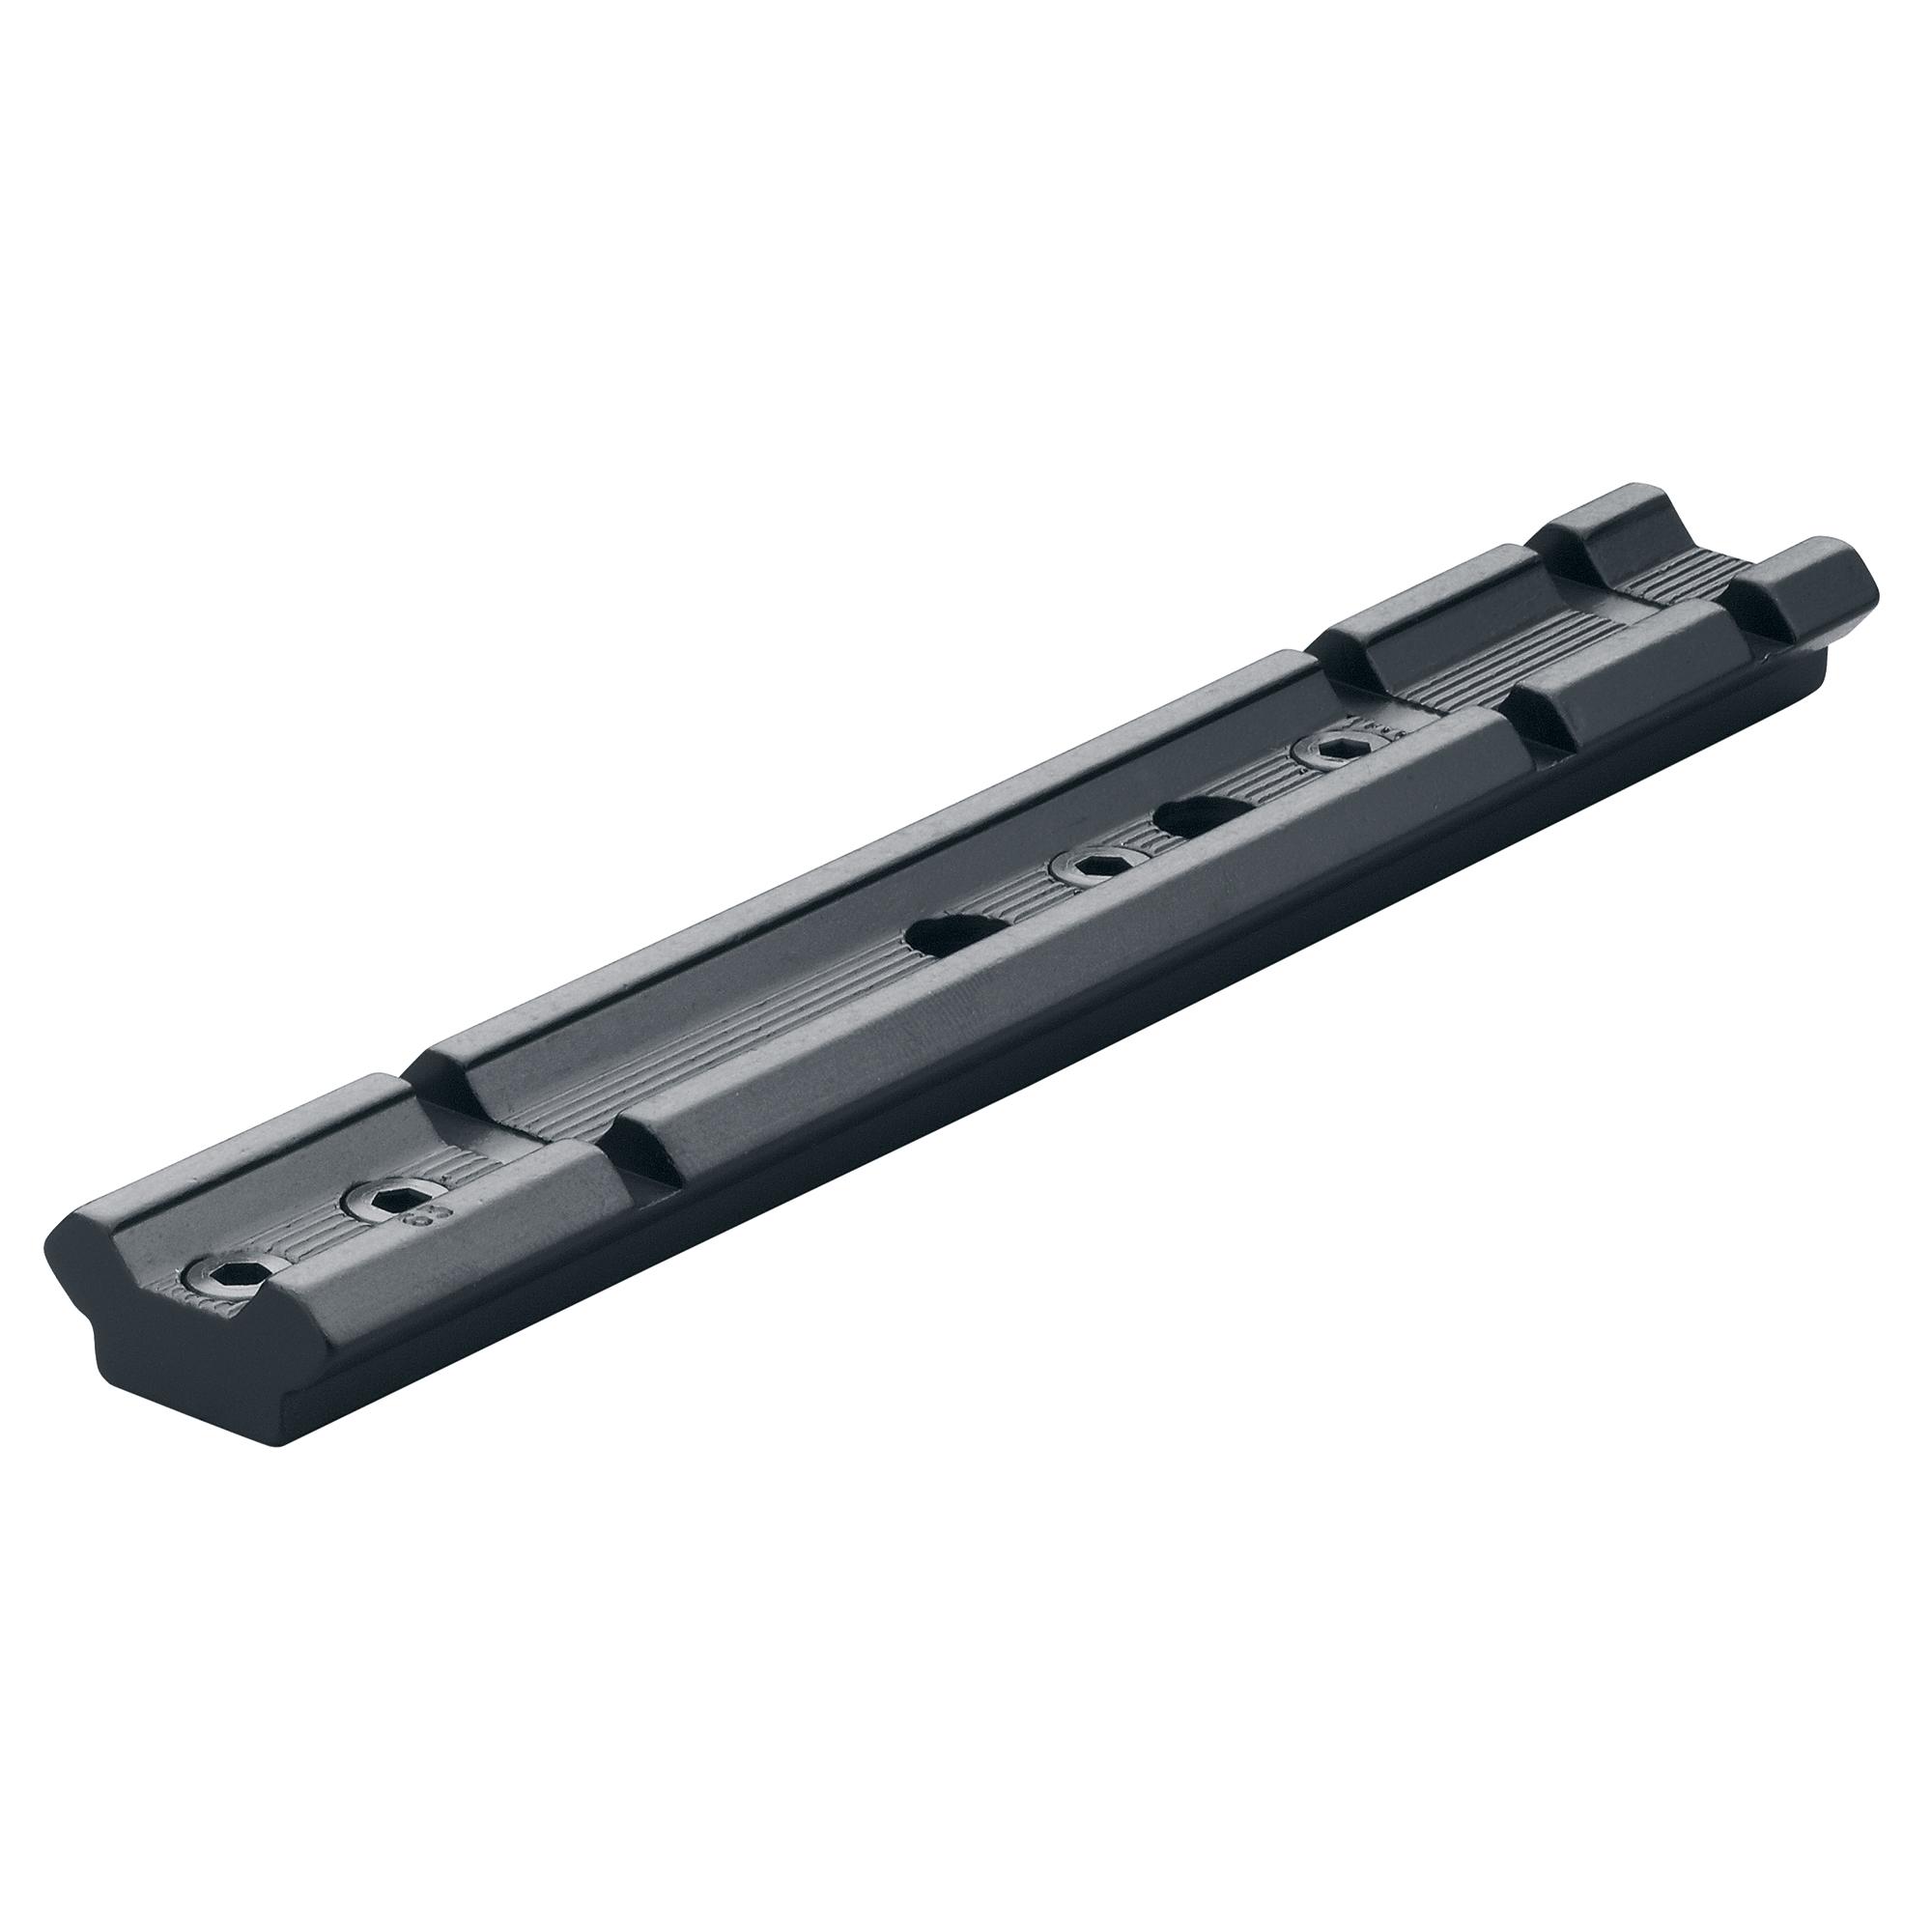 Leupold Rifleman Mounting System Base, T/C Encore & Omega, 1-Piece